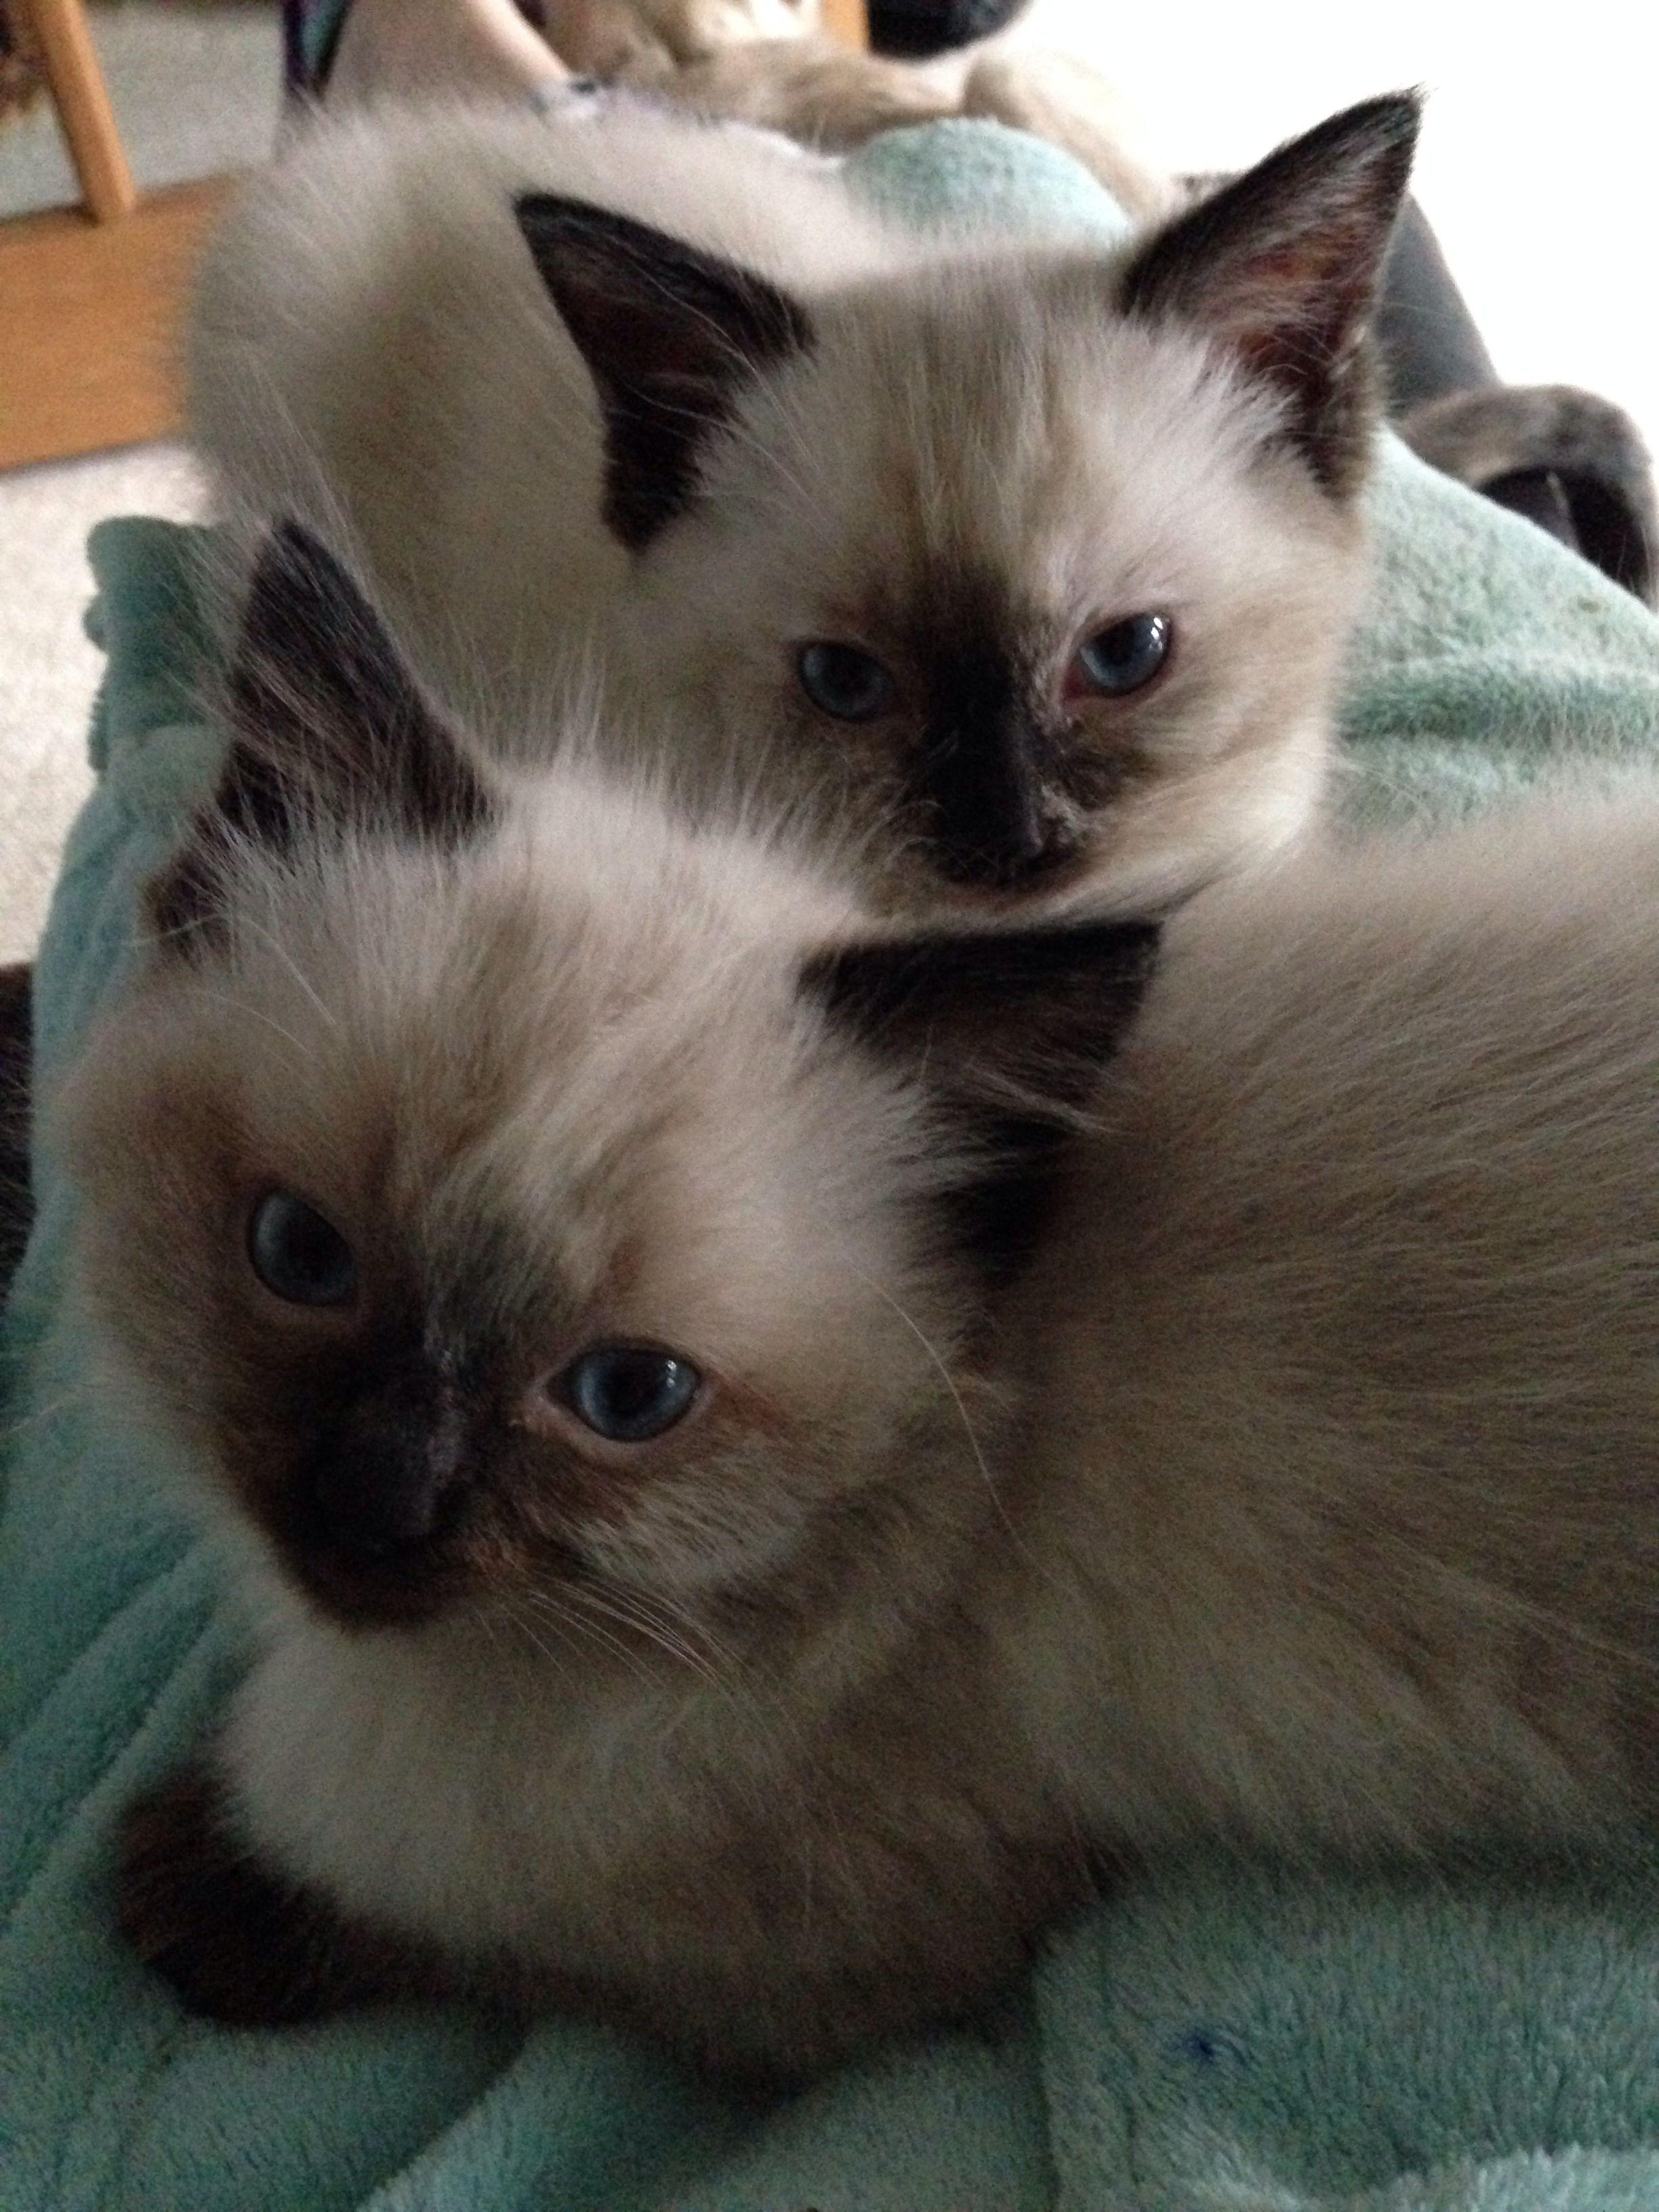 Chocolate Seal Point Ragdoll Kittens Kittens Cutest Pretty Cats Cute Cats